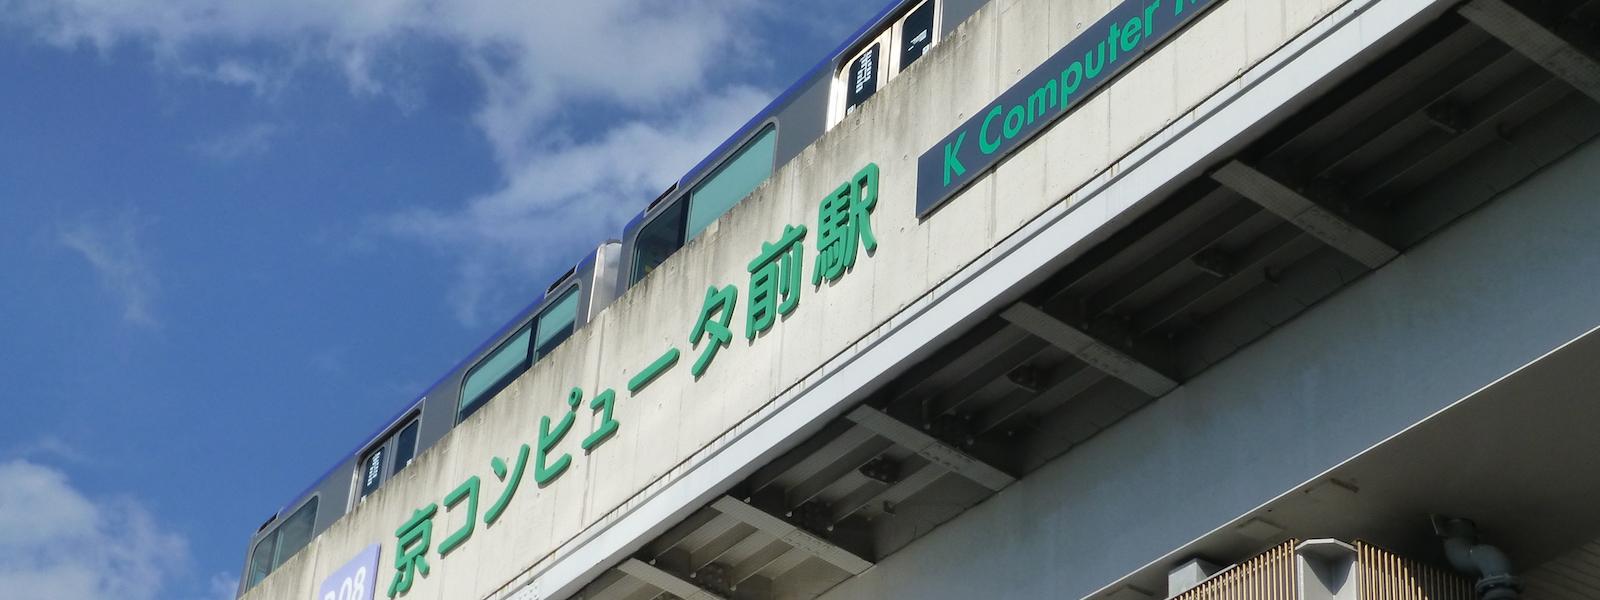 K Computer Mae Station